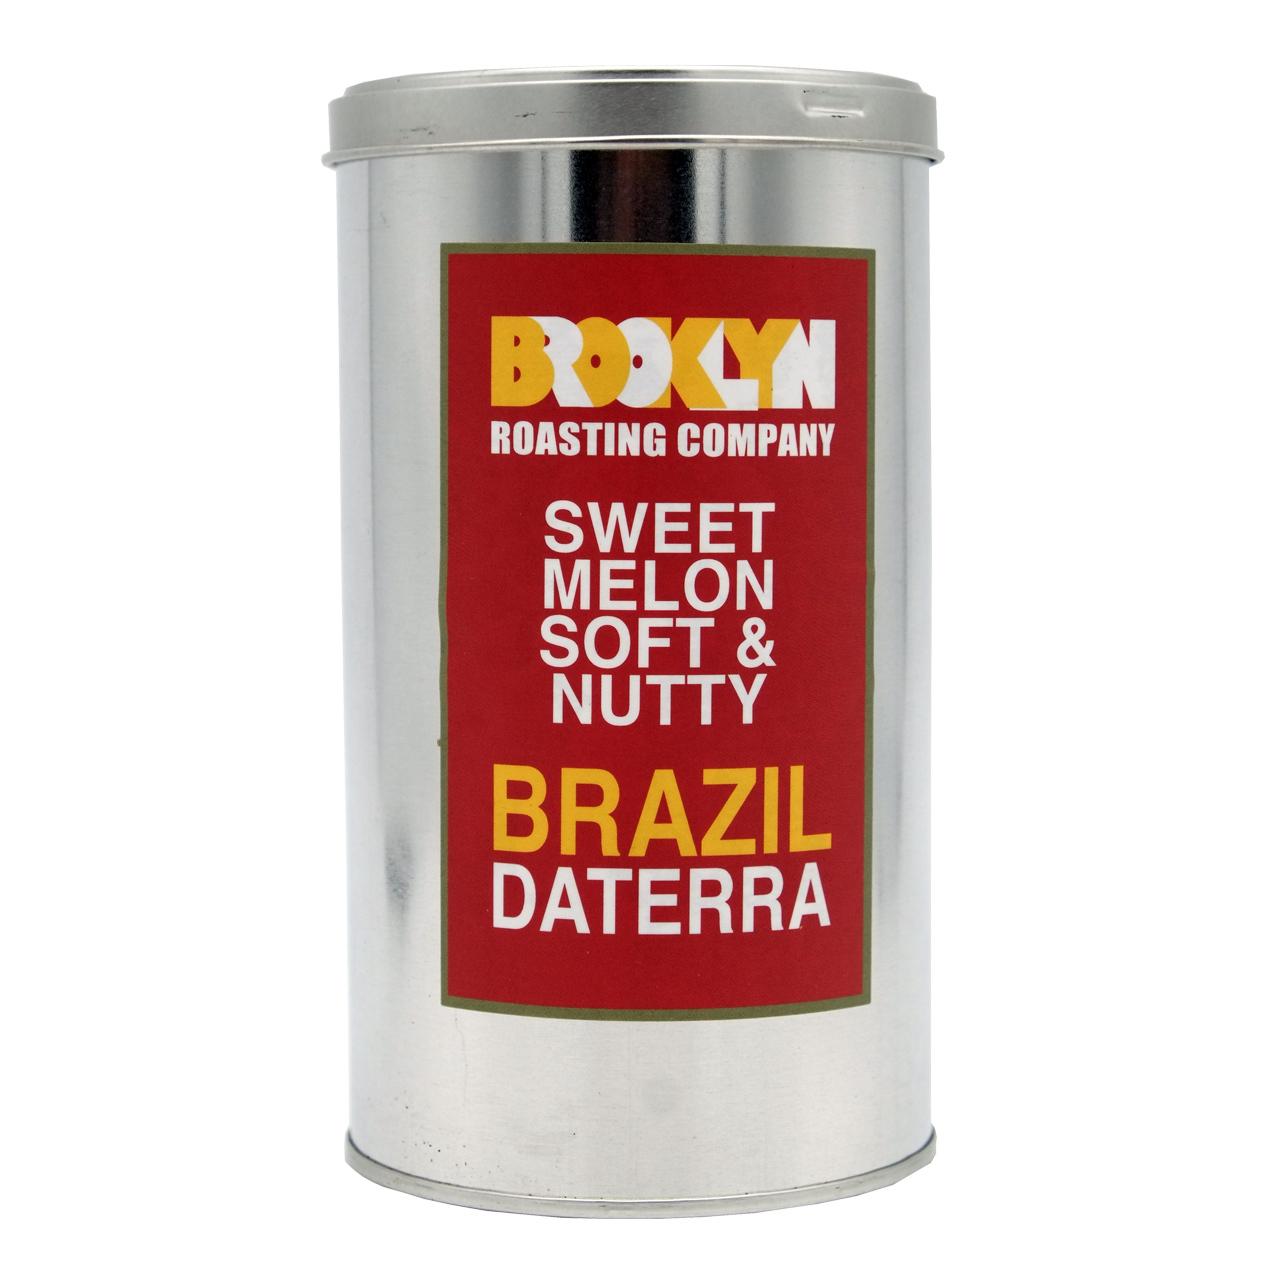 Brazil Daterra 12oz 缶入り(340g)